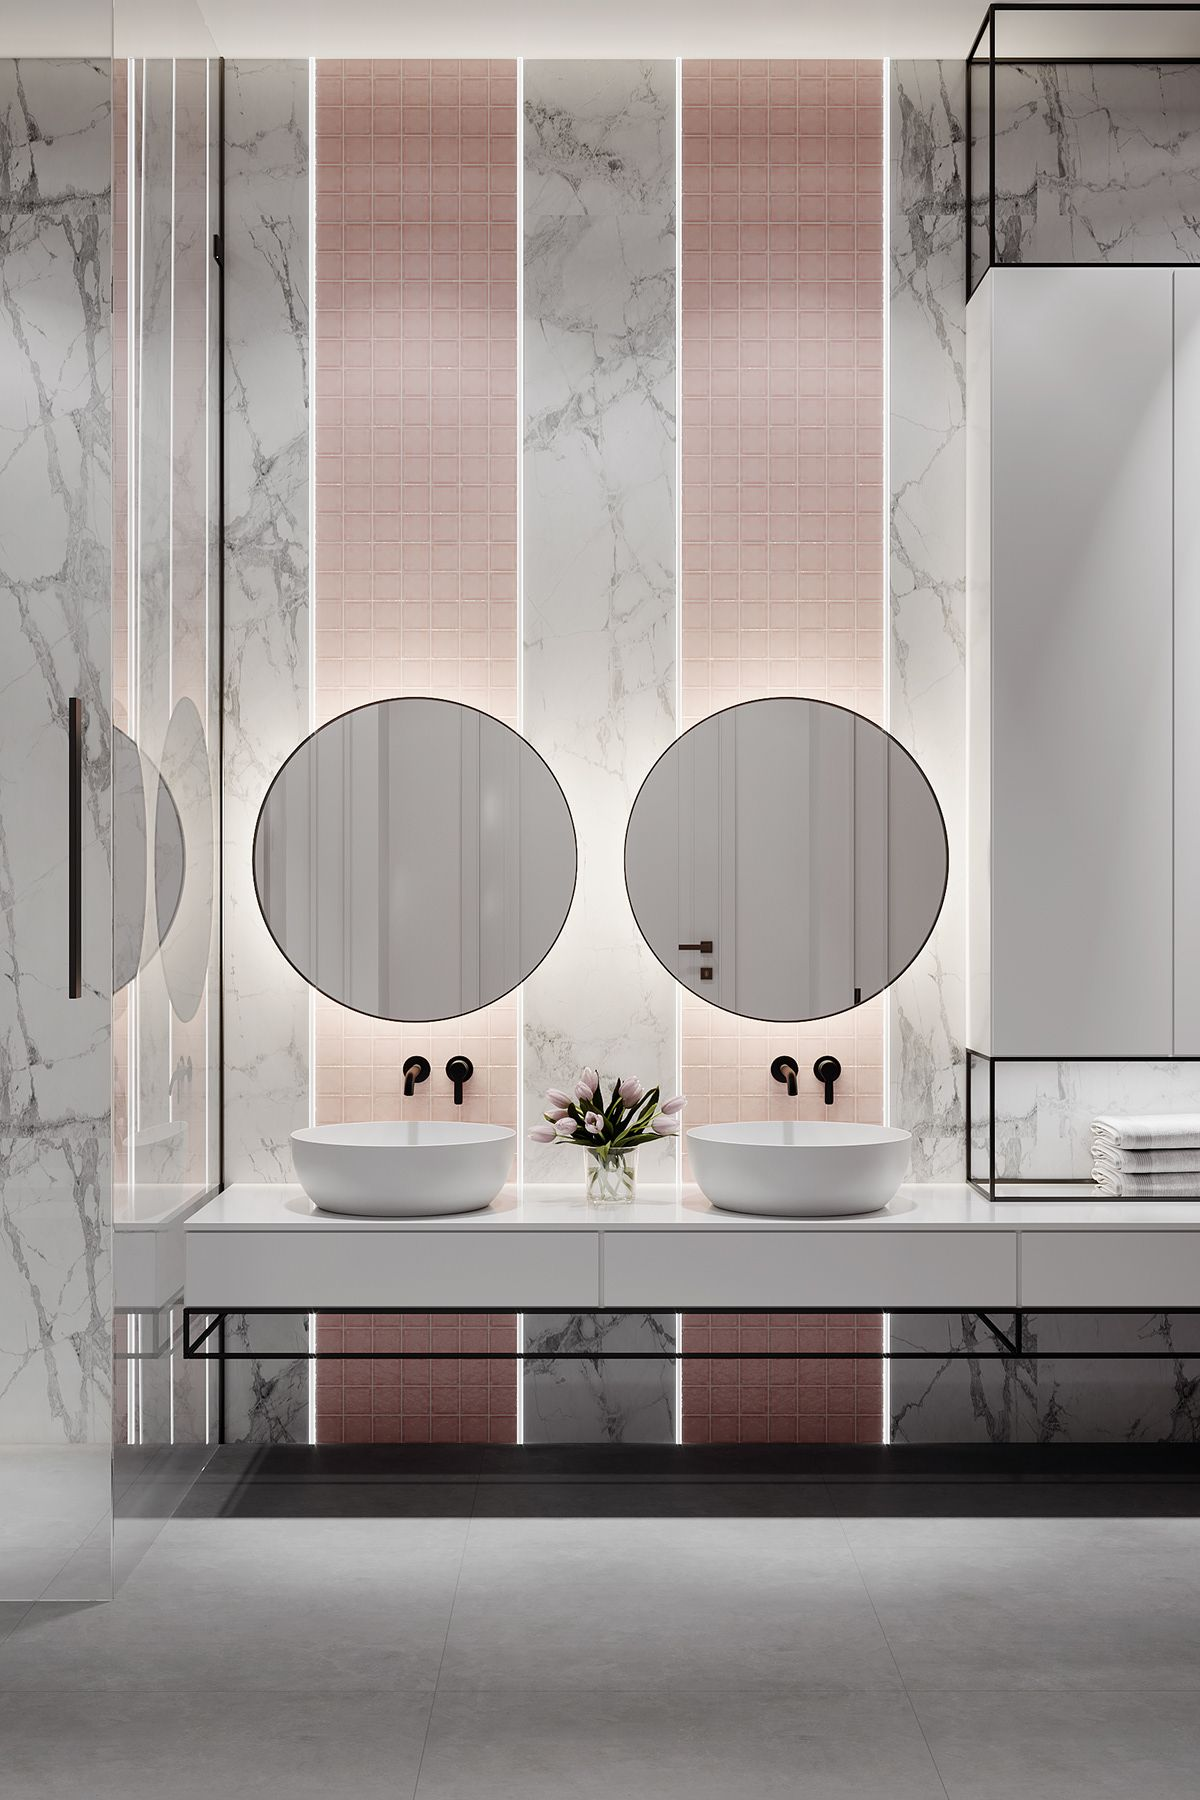 Tikhayapartment On Behance Neoclassical Interior Design Contemporary Bathroom Designs Bathroom Trends